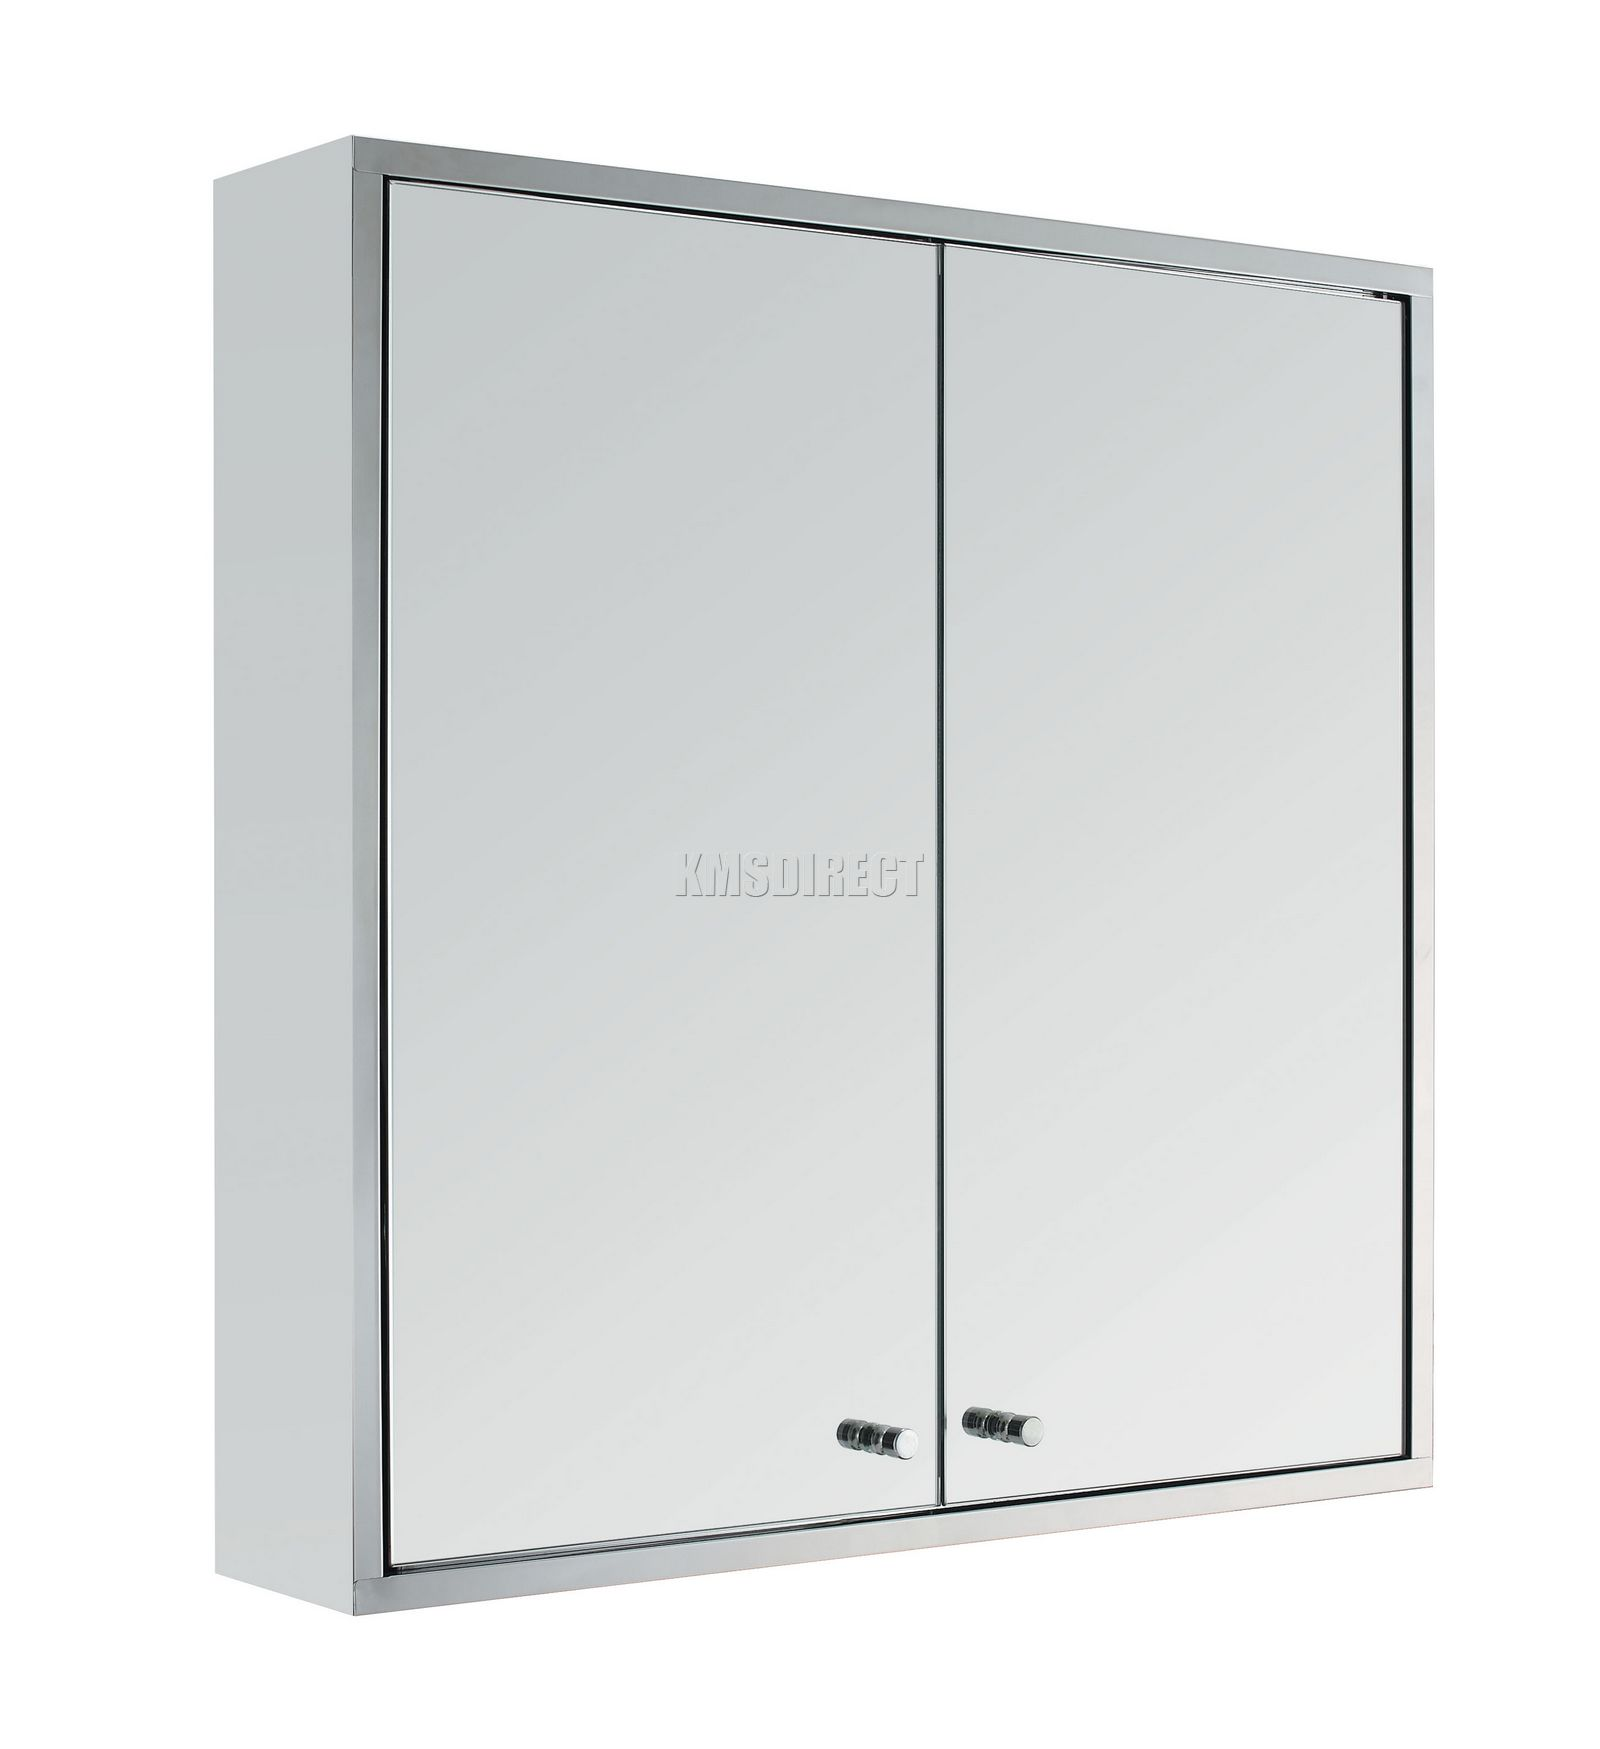 Stainless Steel Wall Mount Mirror Bathroom Cabinet Storage